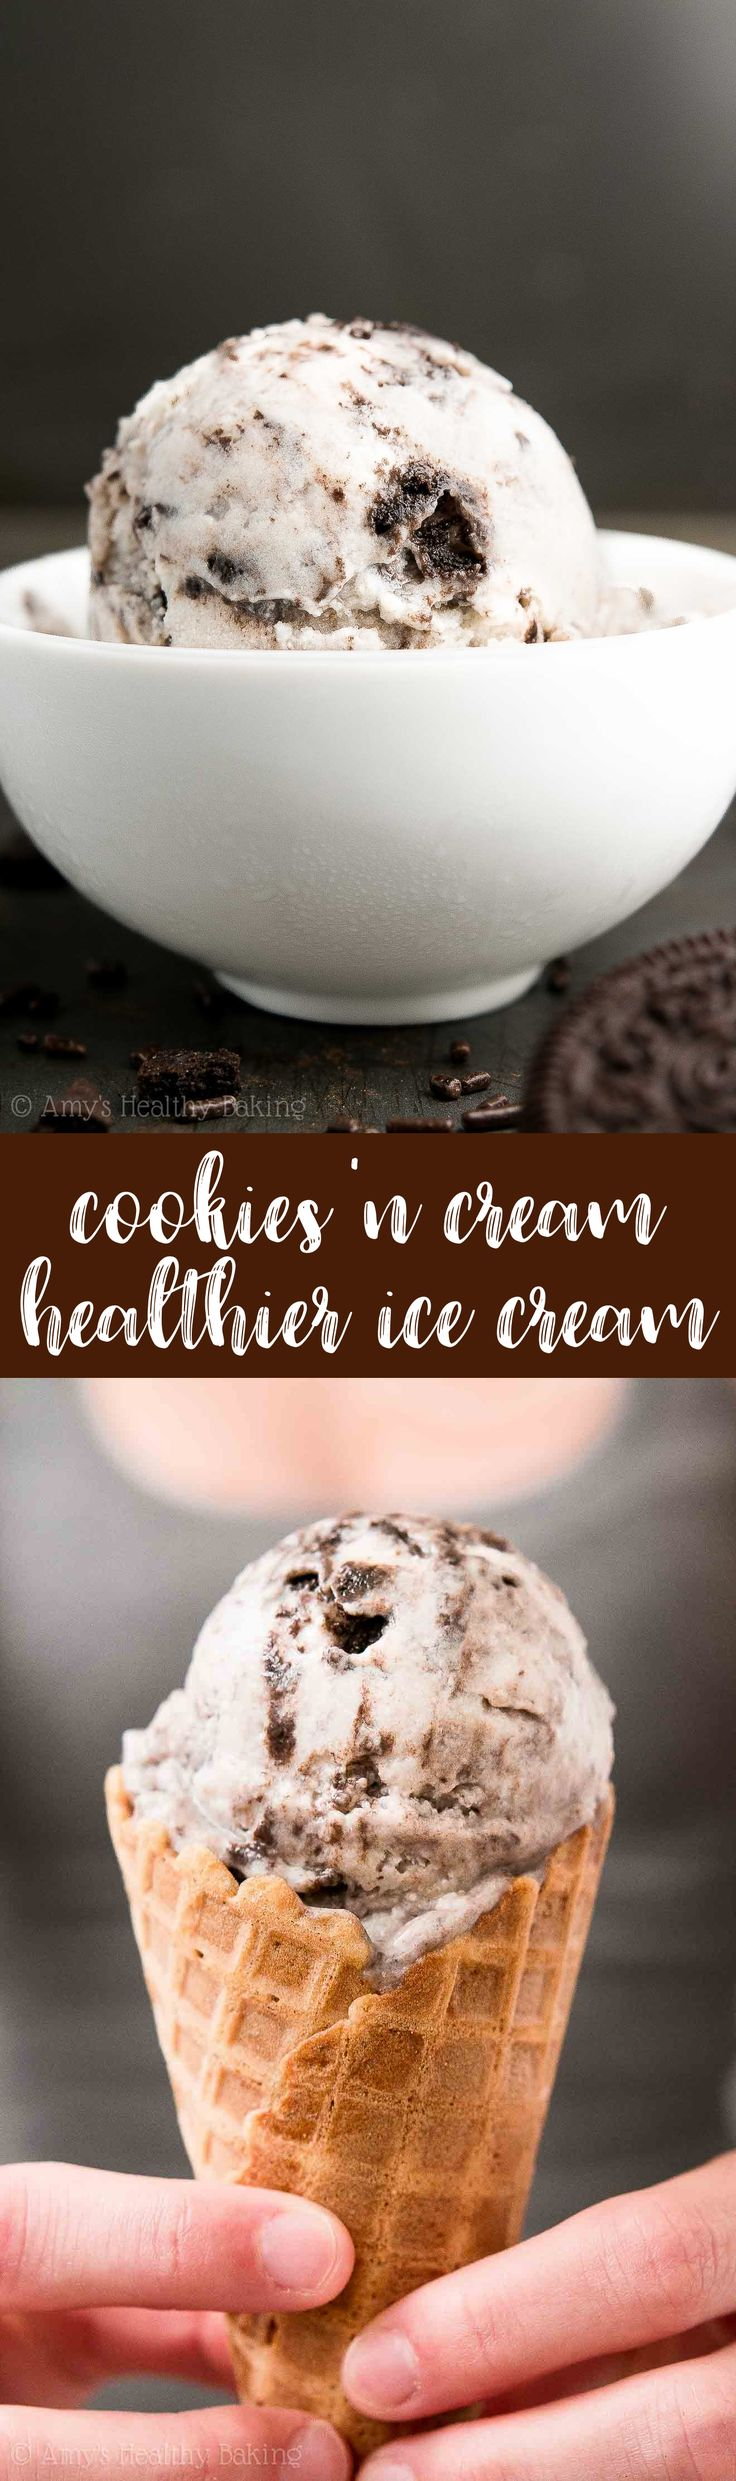 Park Art|My WordPress Blog_Oreo Coffee Creamer Nutrition Facts